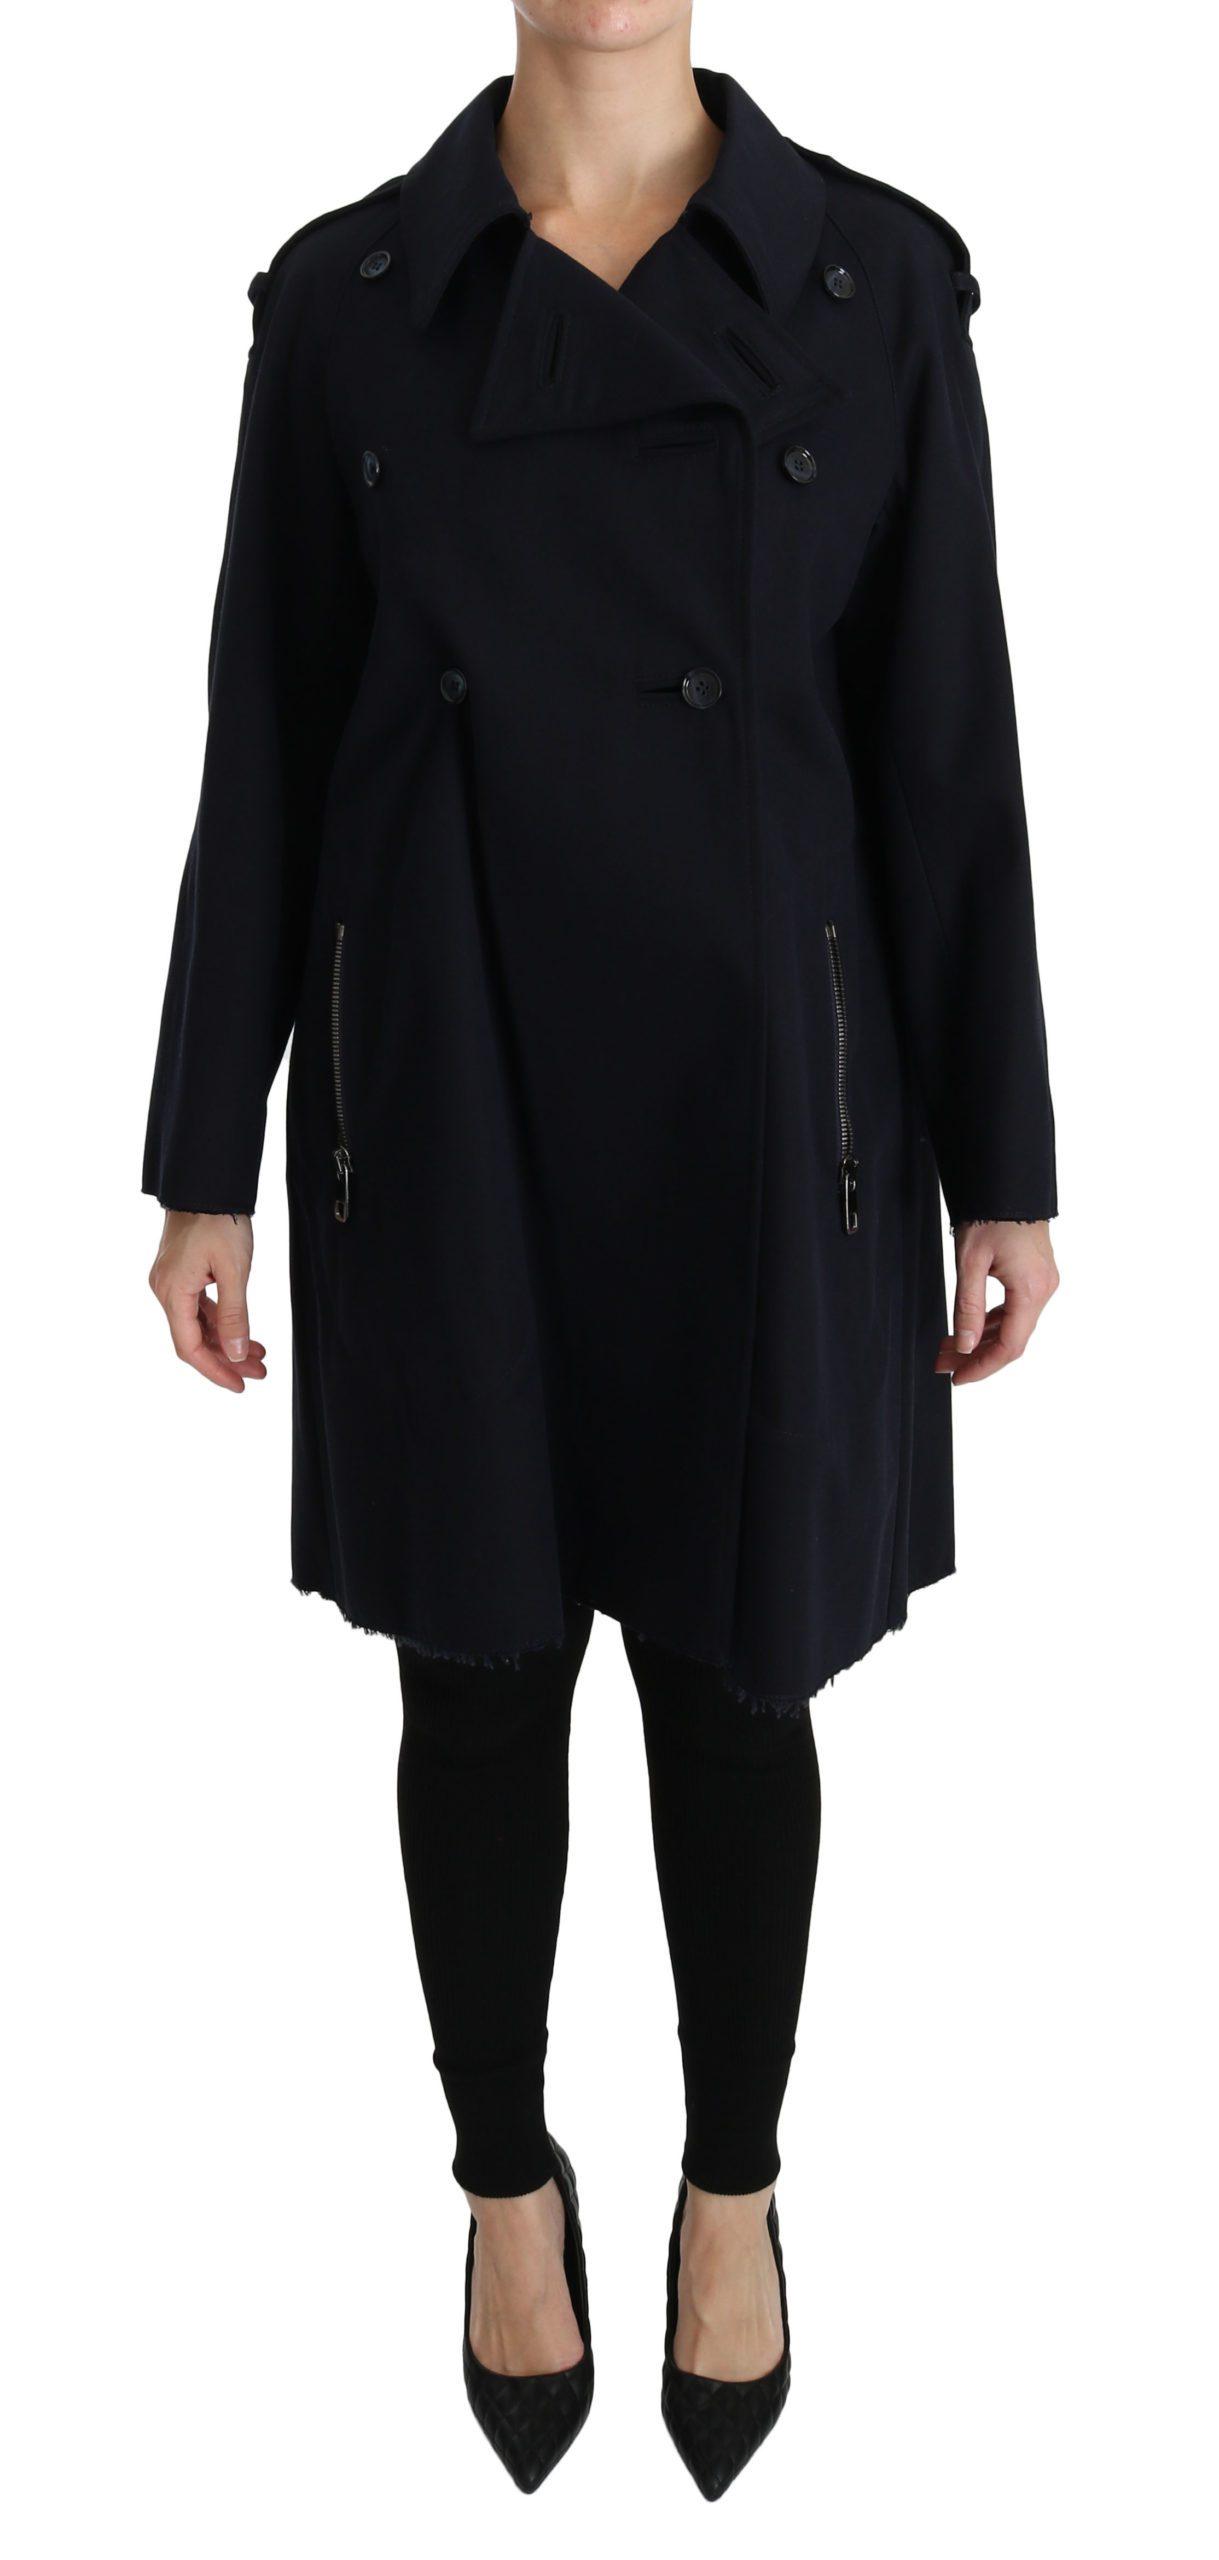 Dolce & Gabbana Women's Cotton Women Trench Jacket Blue JKT2495 - IT36 | XS